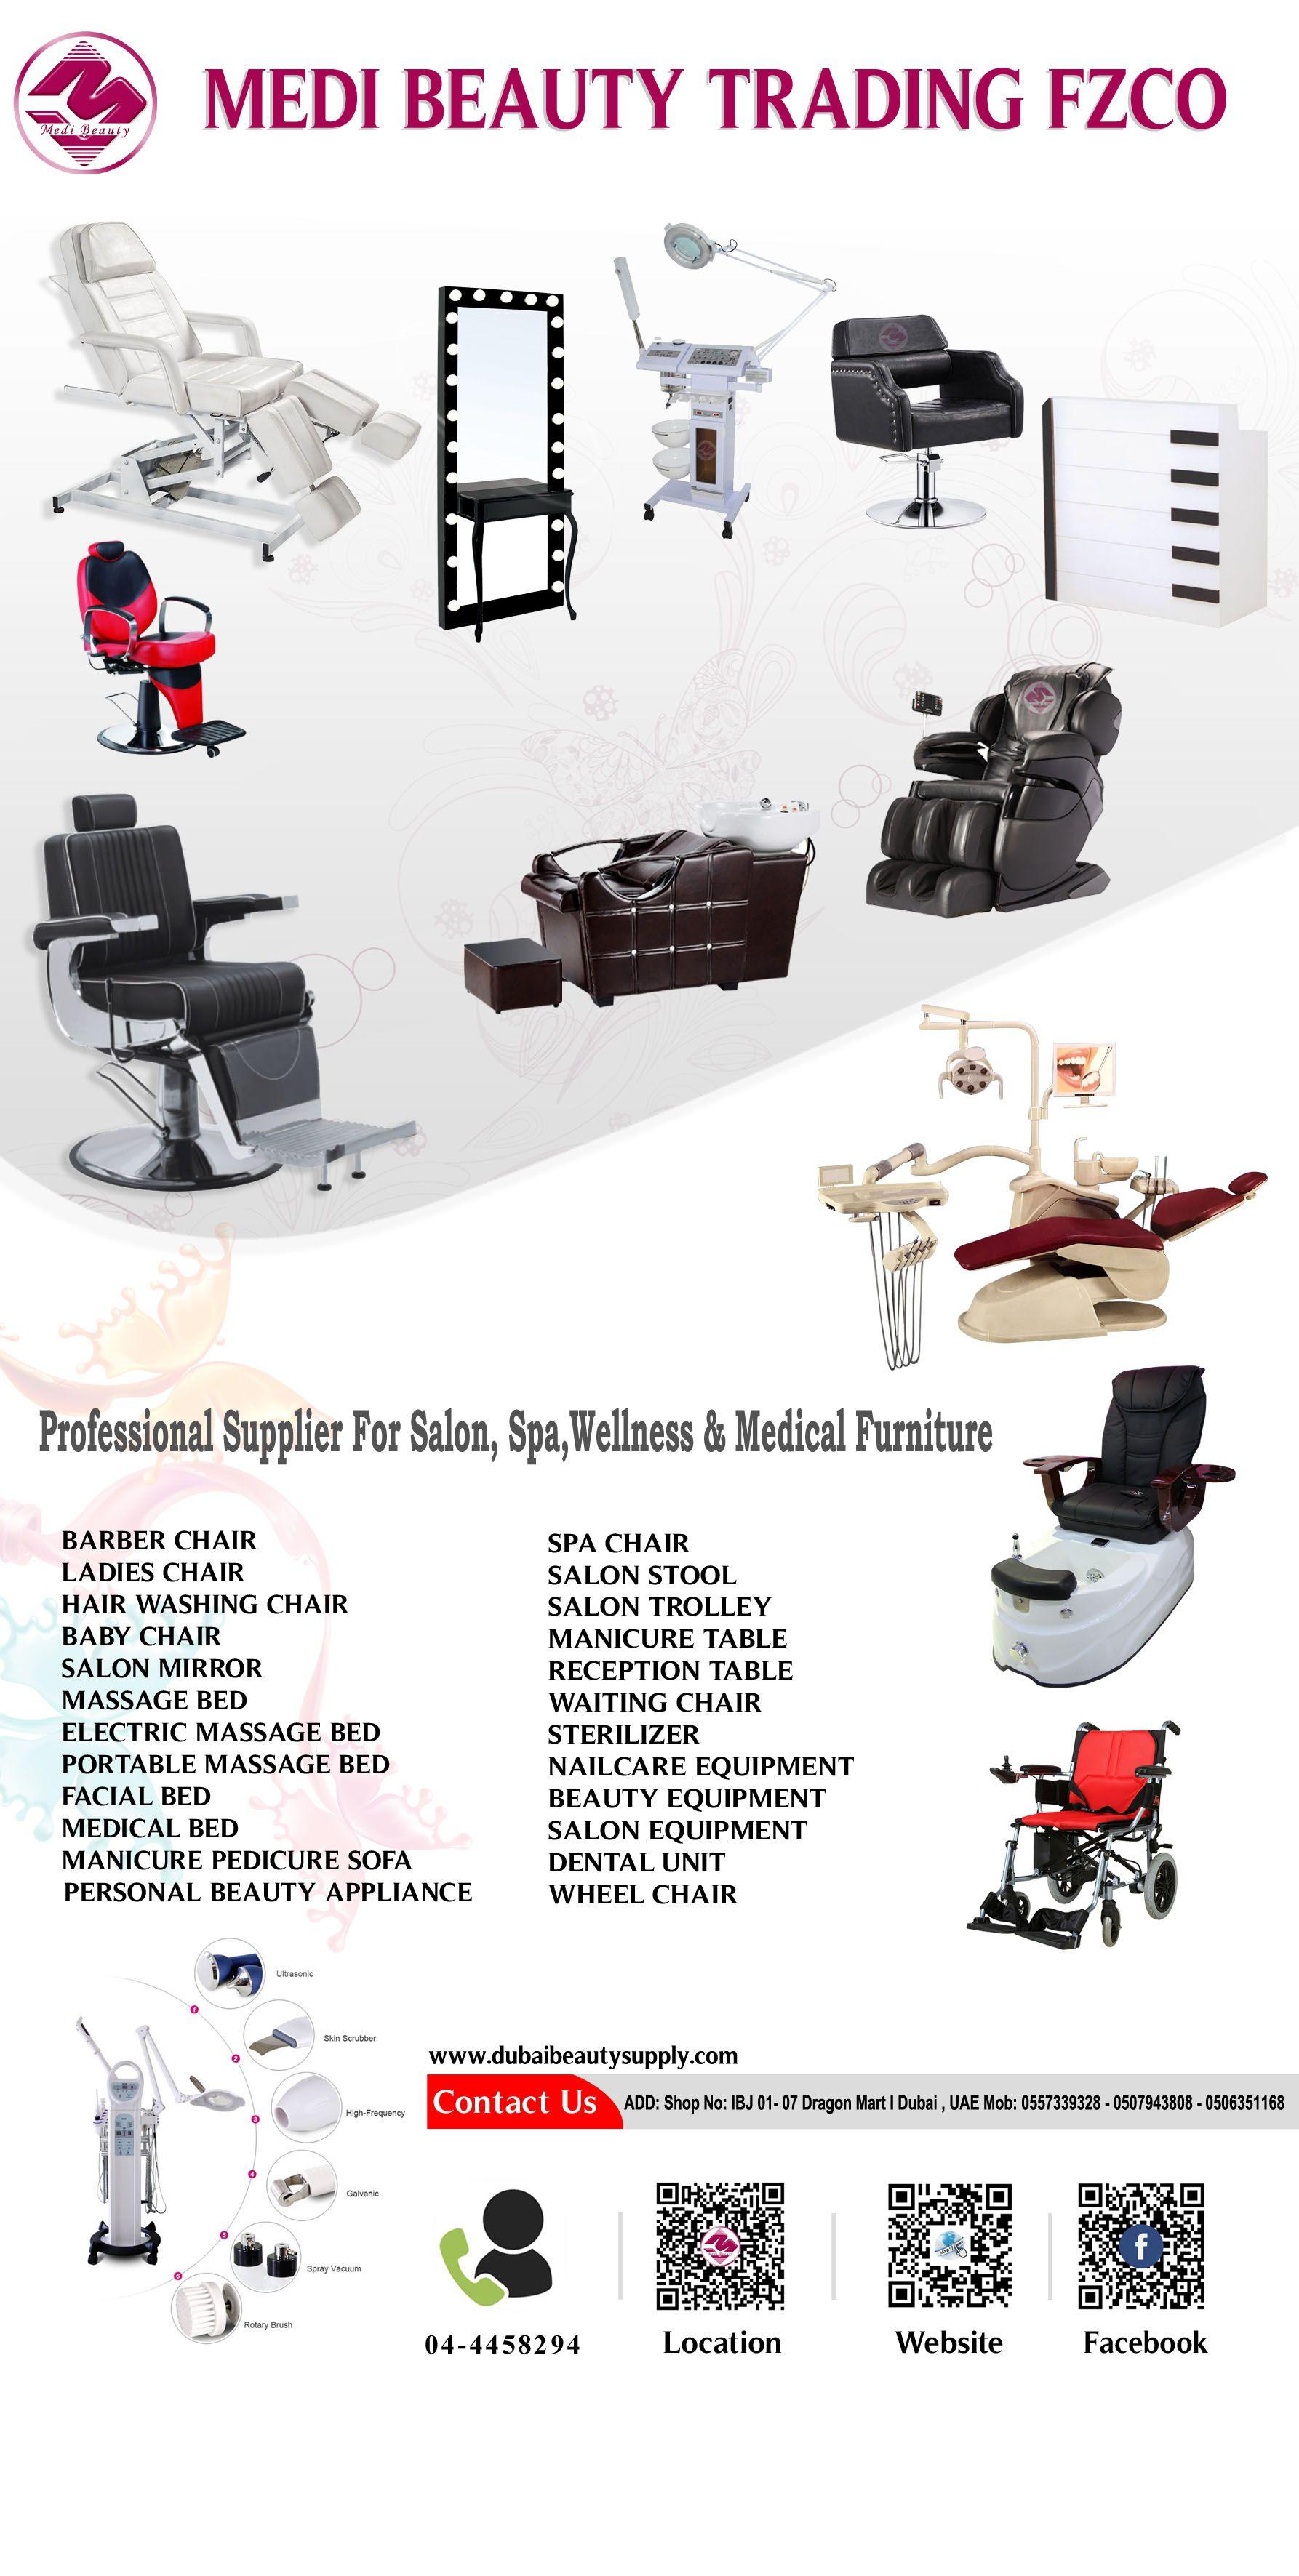 Medi Beauty Trading Products Dubai Uae Salon Furniture Equipments Spa Chairs Massage Beds Salon Furniture Barber Chair